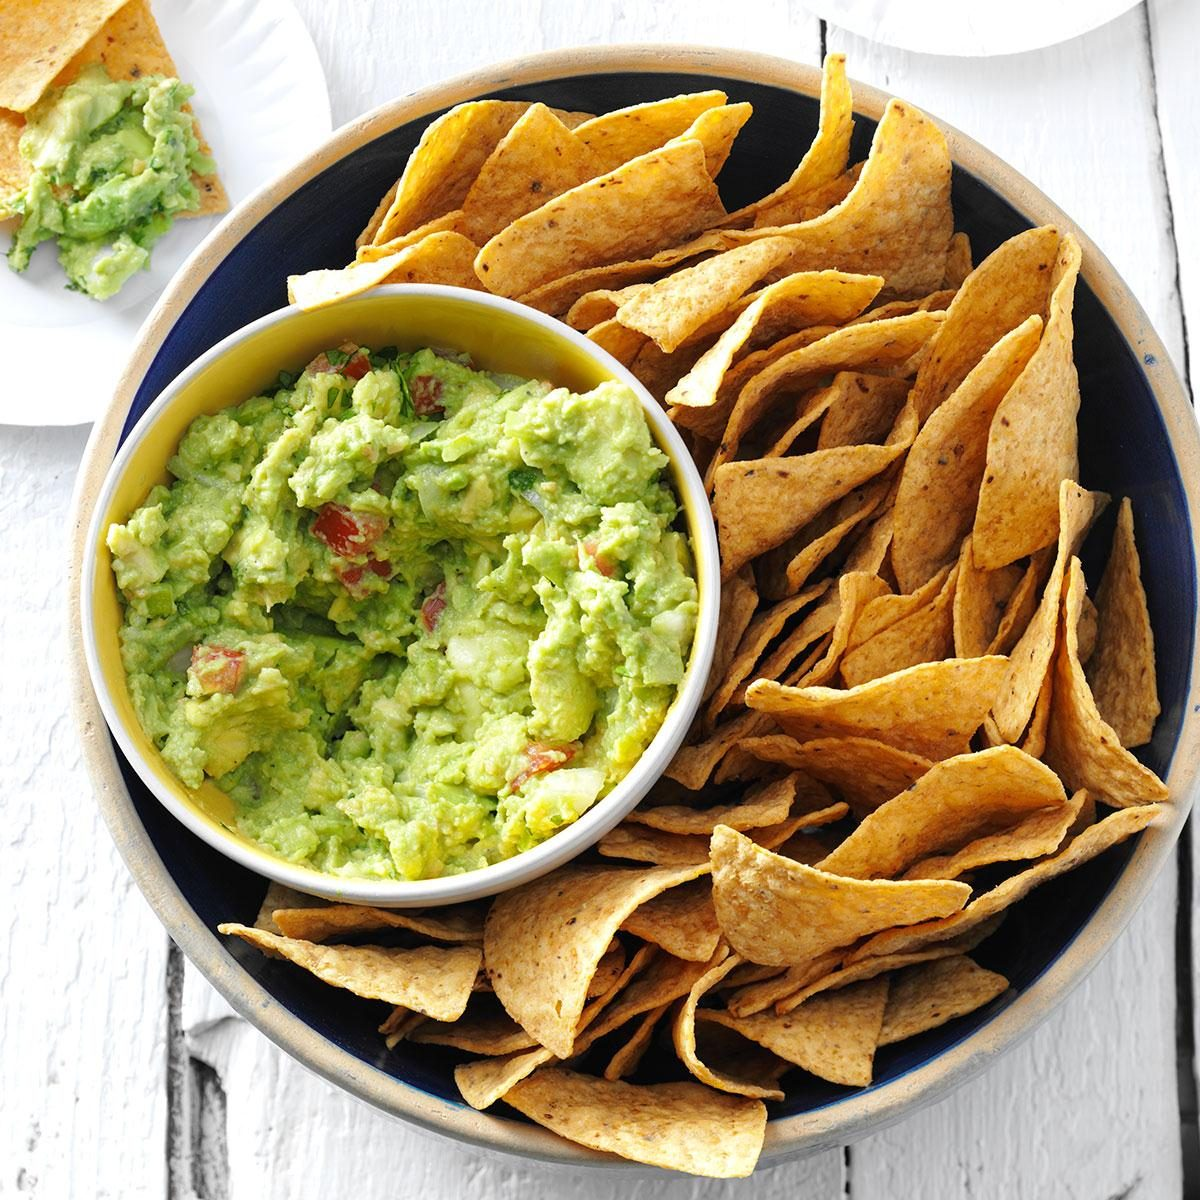 Catherine's Guacamole Recipe | Taste of Home